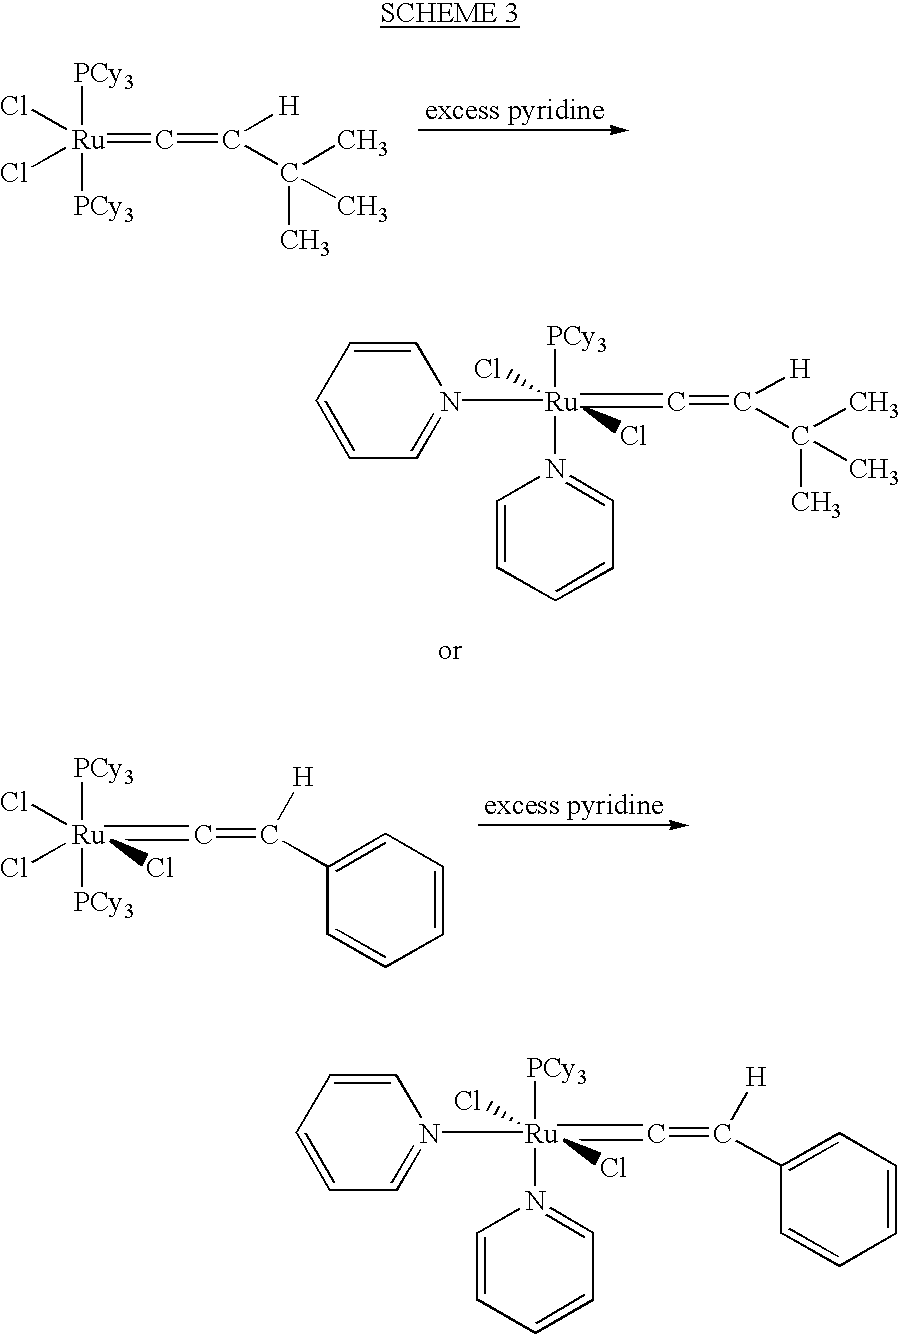 ruthenium carbene metathesis 46 vol 40, no 2 • 2007 evolution and applications of second-generation ruthenium olefin metathesis catalysts handlingthe earlier characteristics grubbs catalysts.